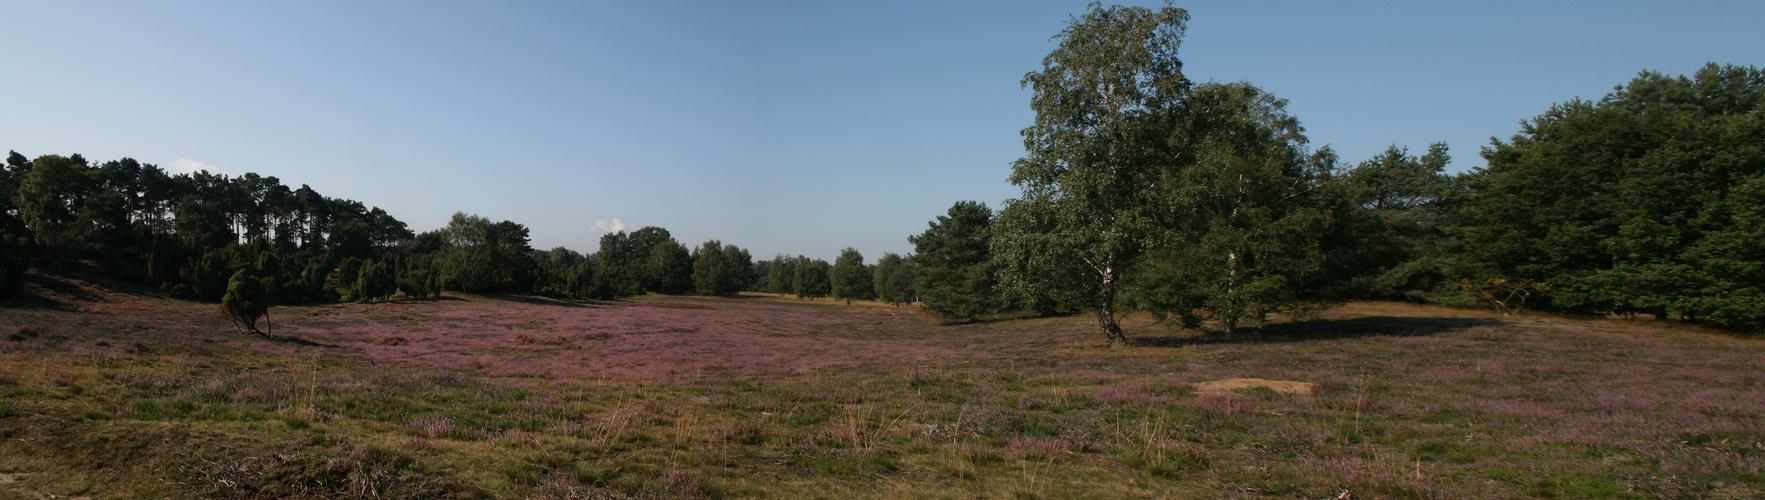 Heide Panorama